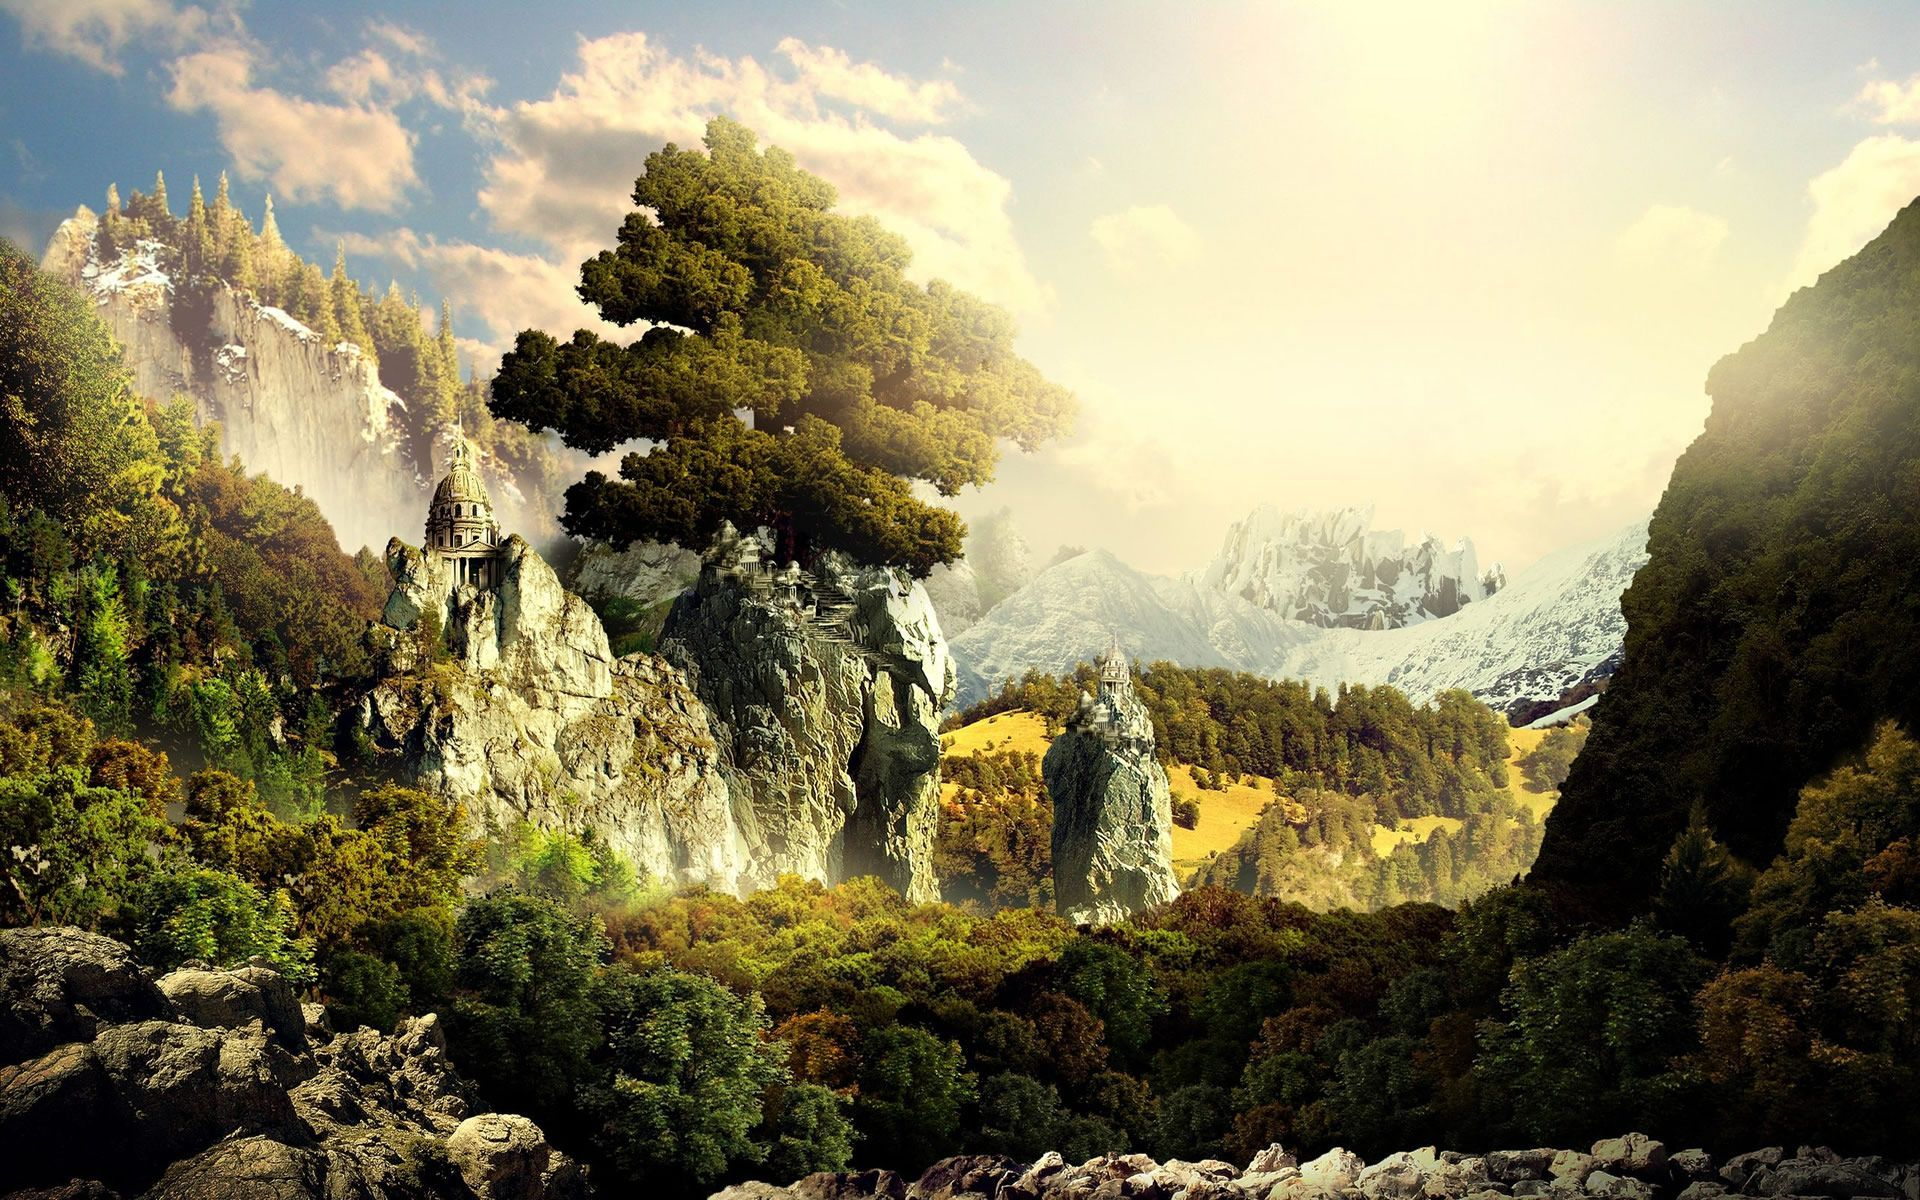 Fantasy landscape wallpapers hd 5 heros odyssey pinterest fantasy landscape wallpapers hd 5 voltagebd Gallery